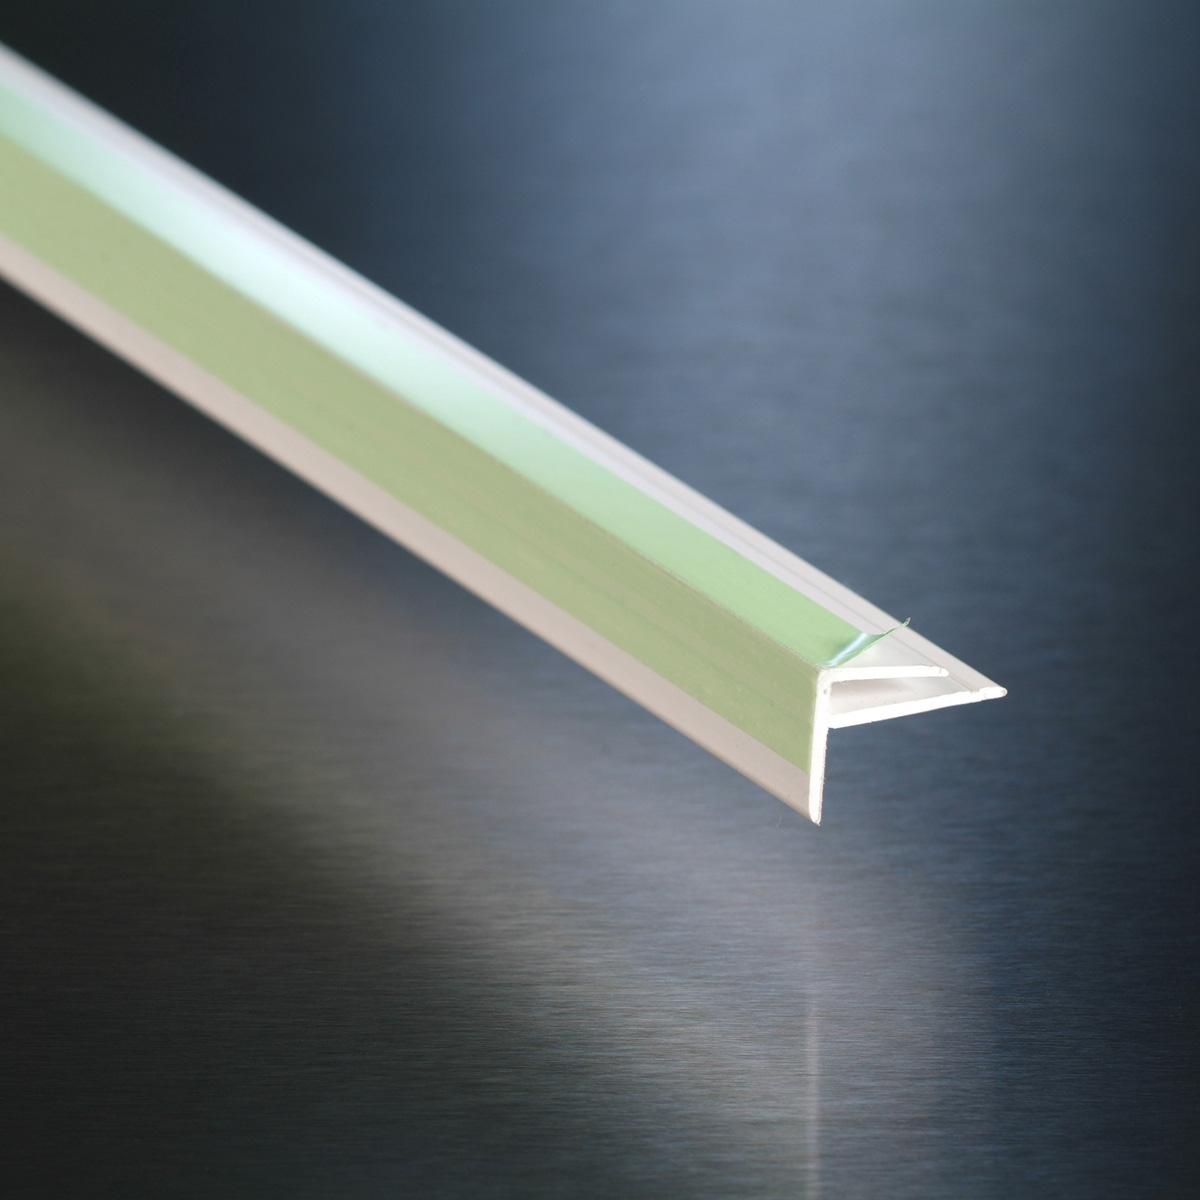 White External Pvc Wall Corner Angle